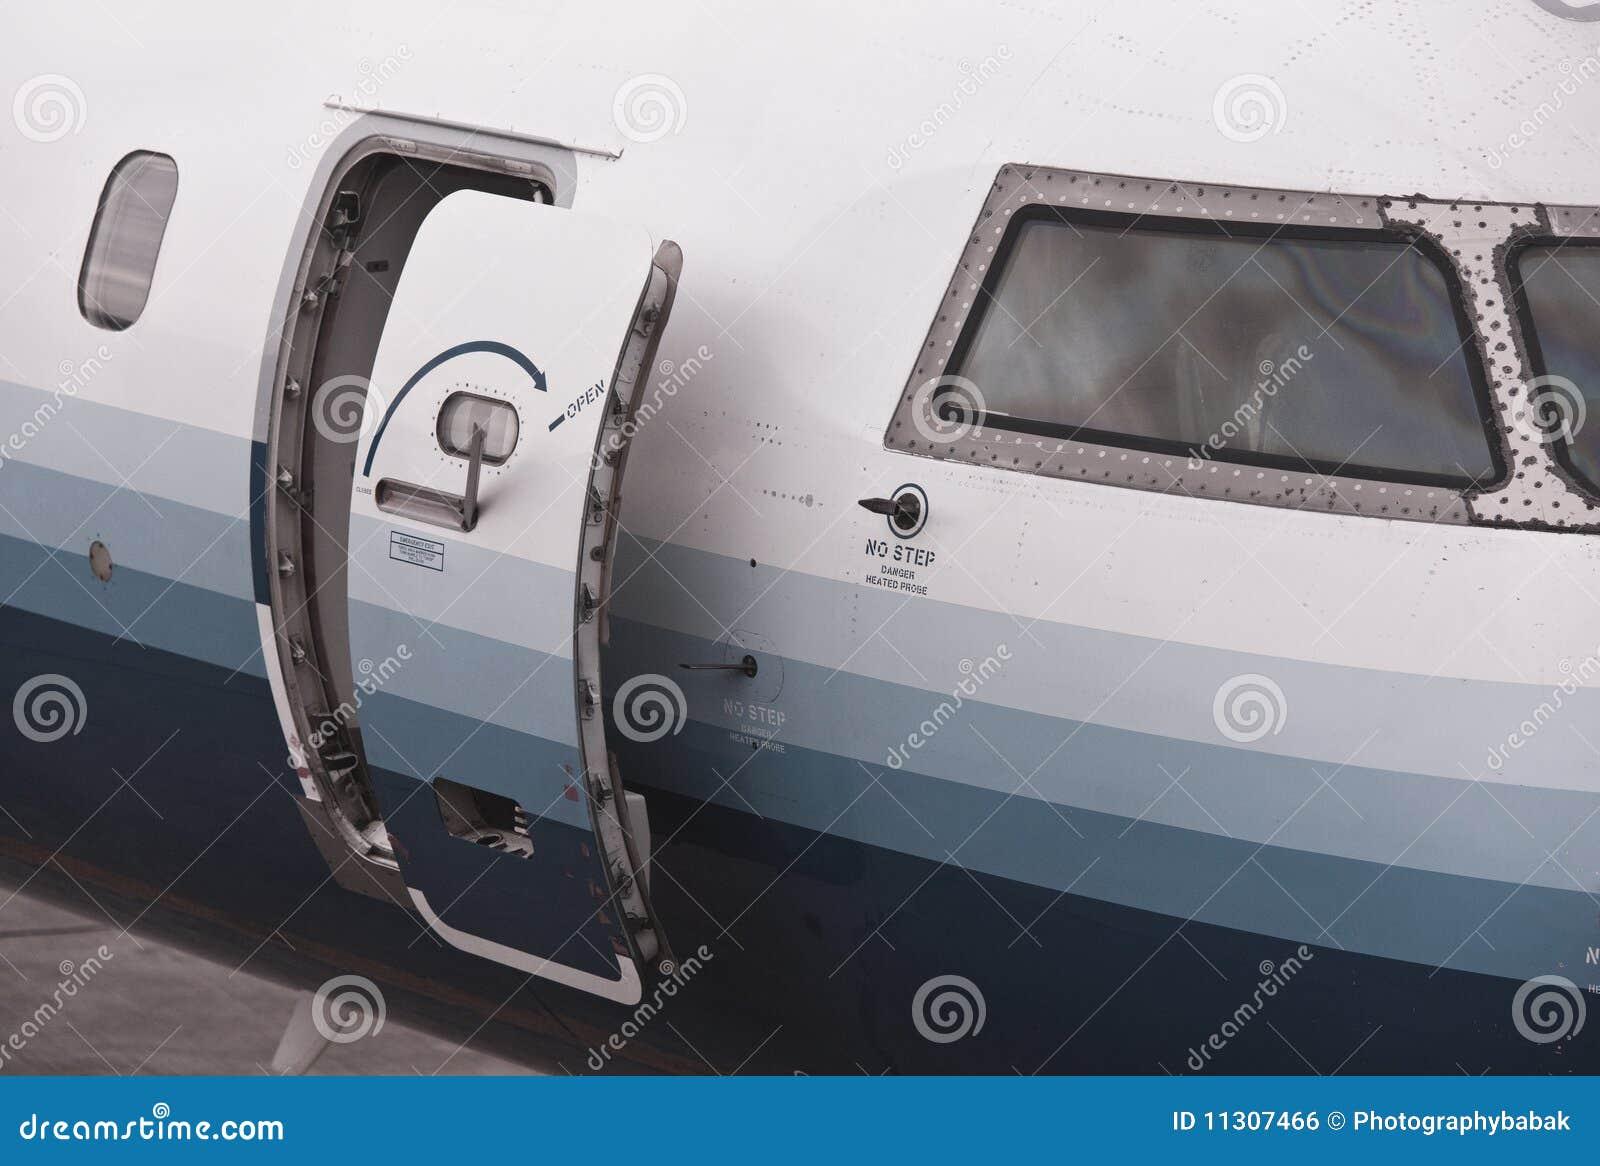 Airplane Door & Airplane Door Royalty Free Stock Image - Image: 11307466 Pezcame.Com